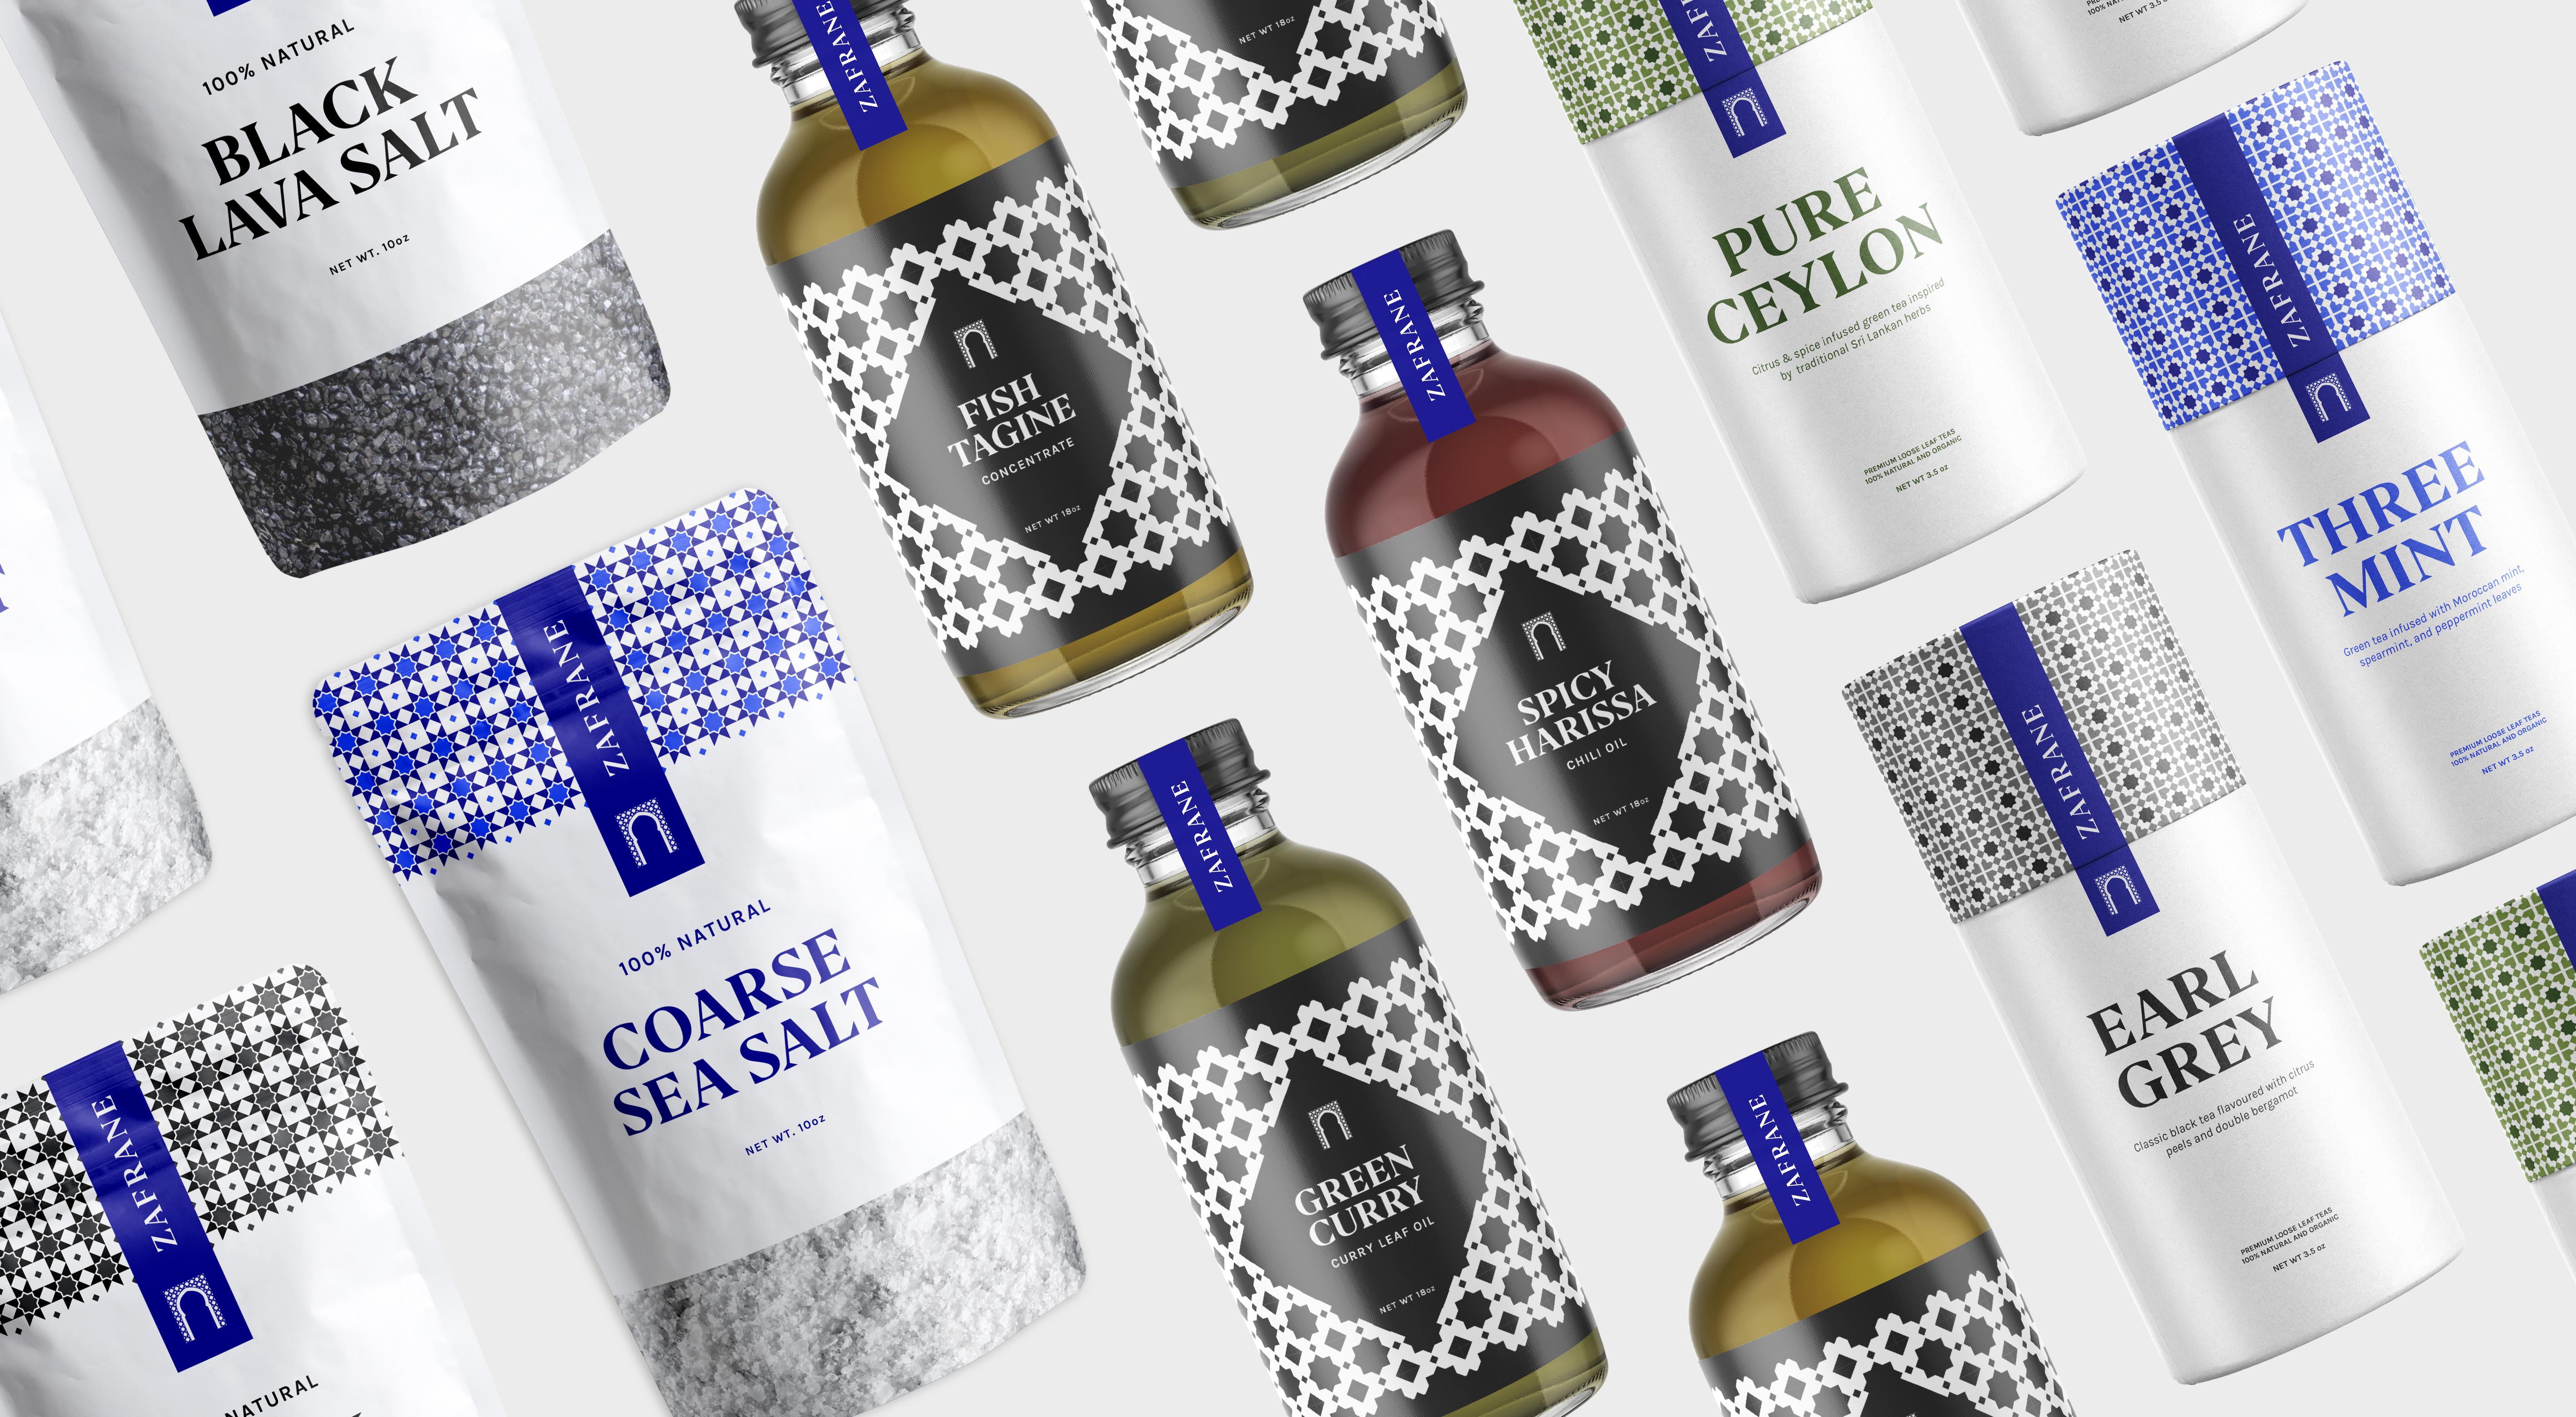 Zafrane Spice & Tea